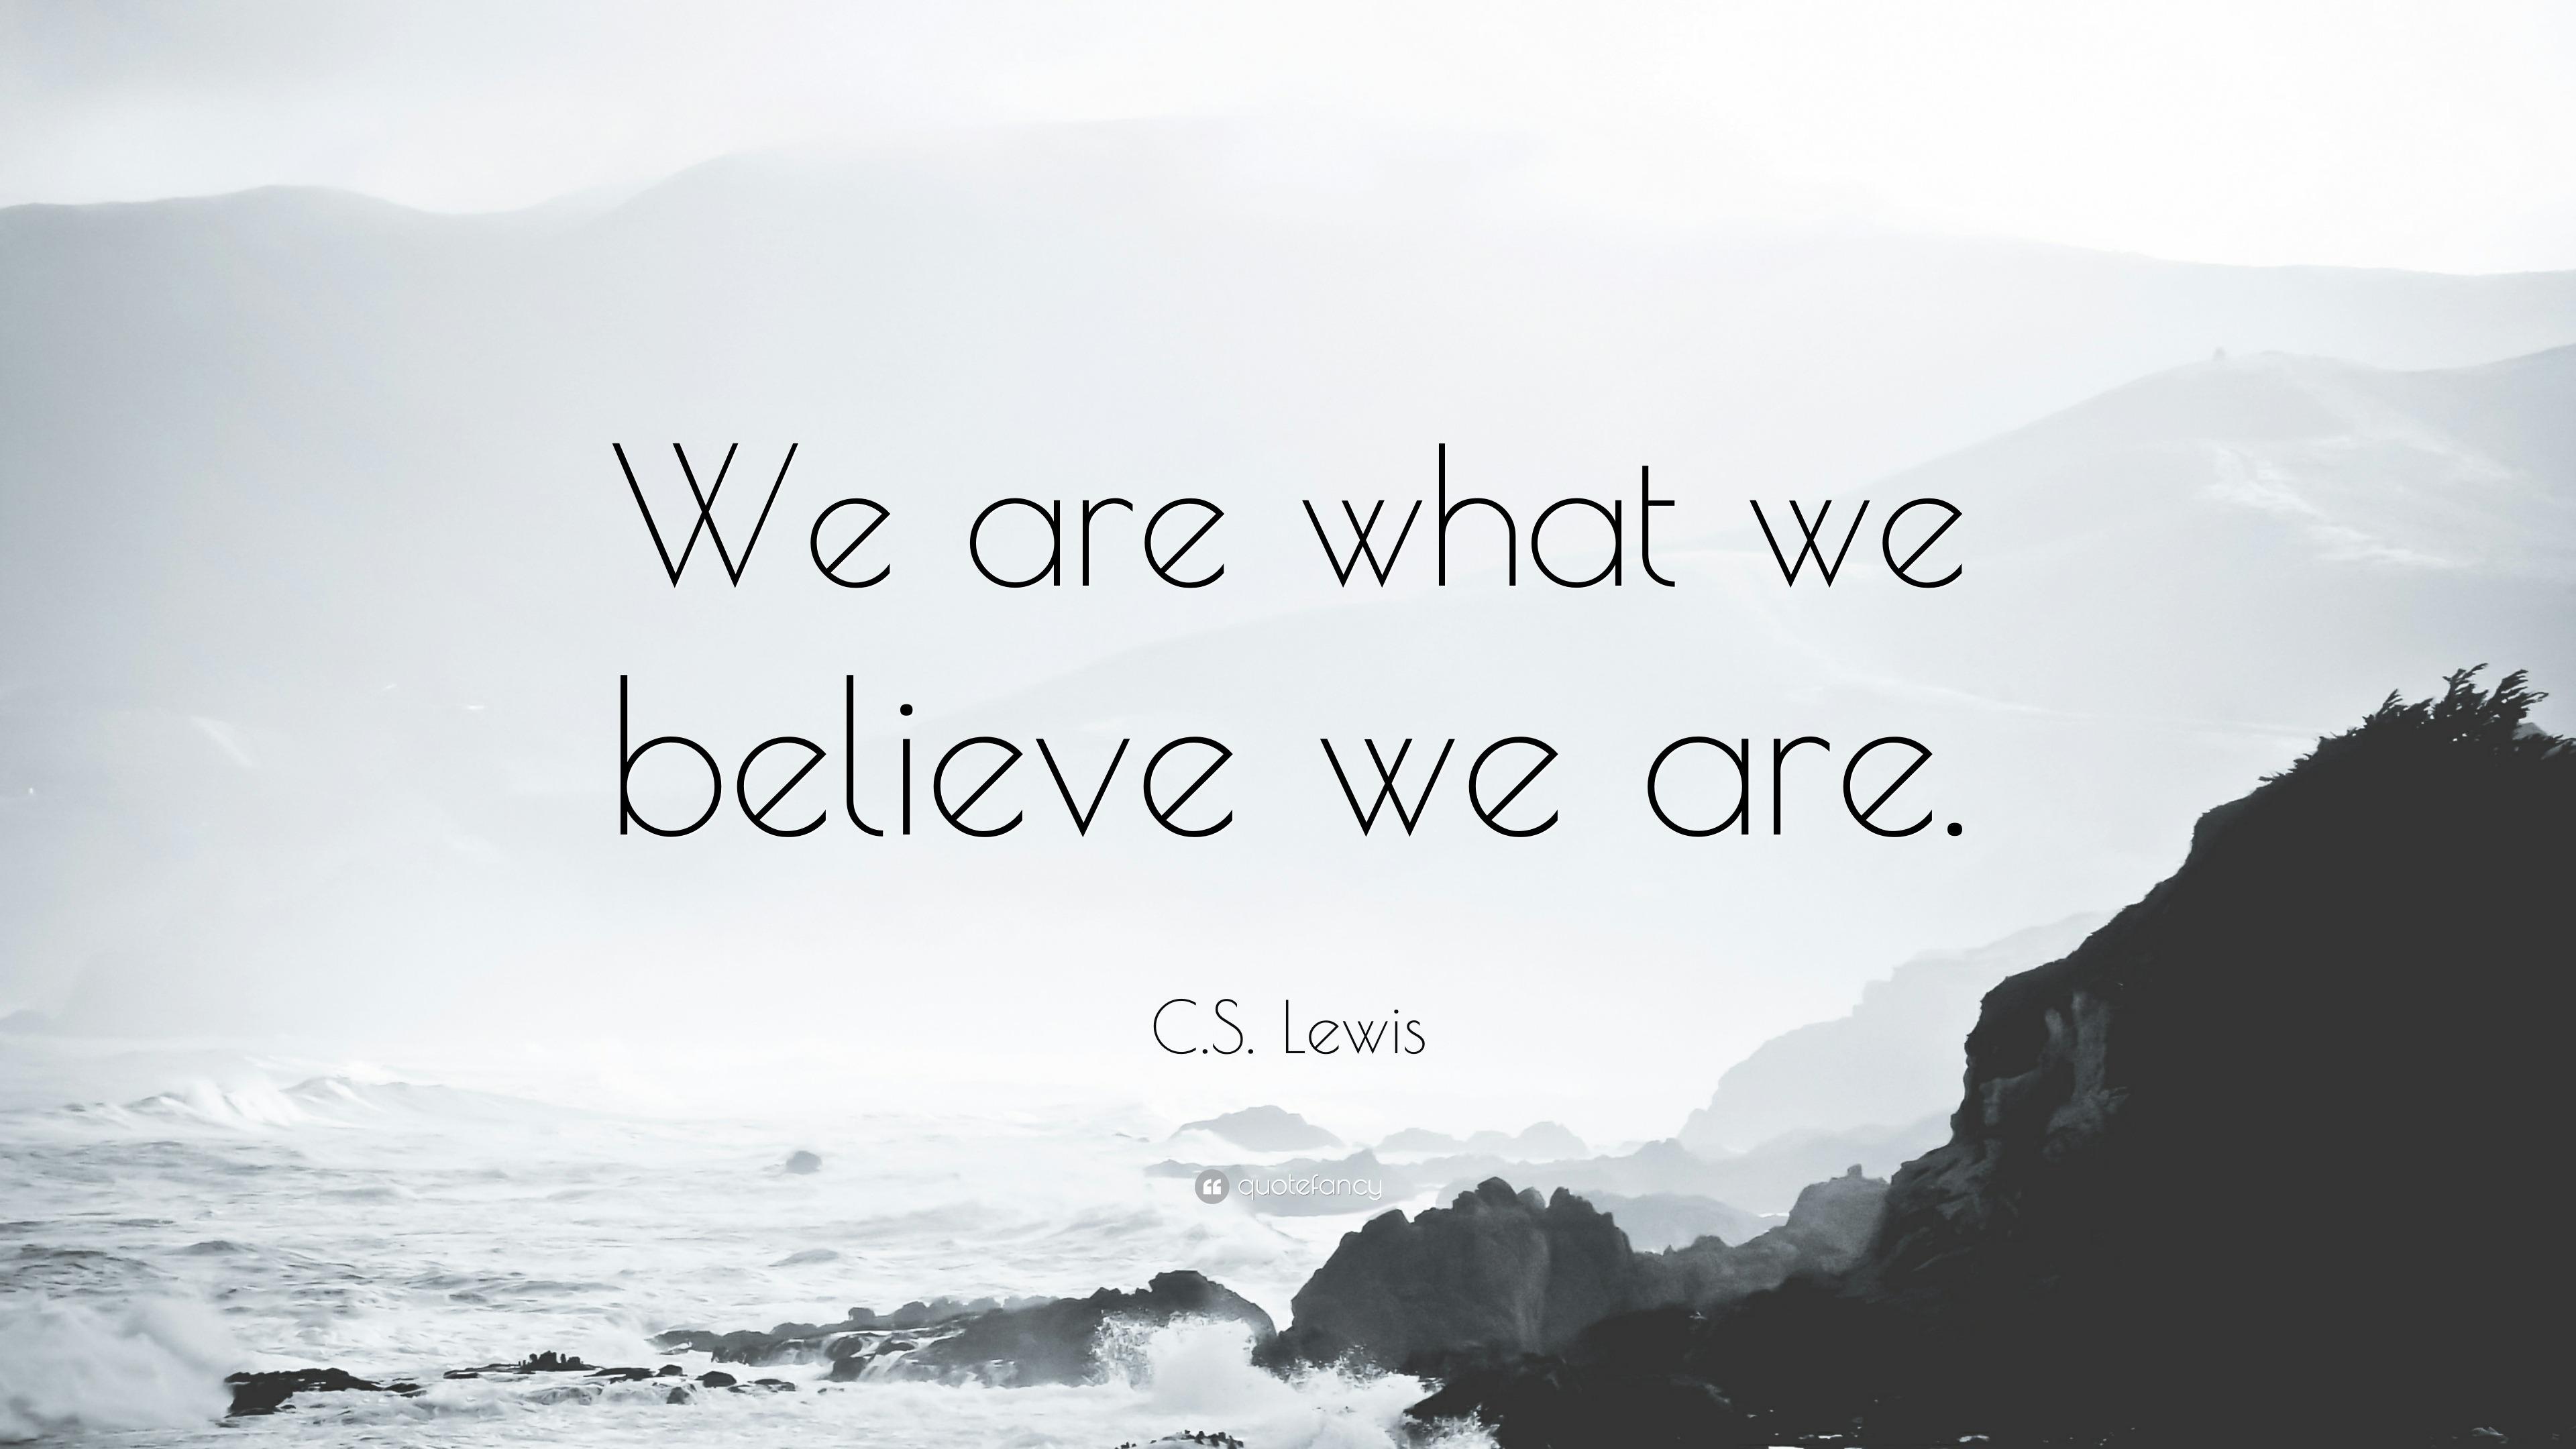 C. S. Lewis Quotes (100 wallpapers) - Quotefancy